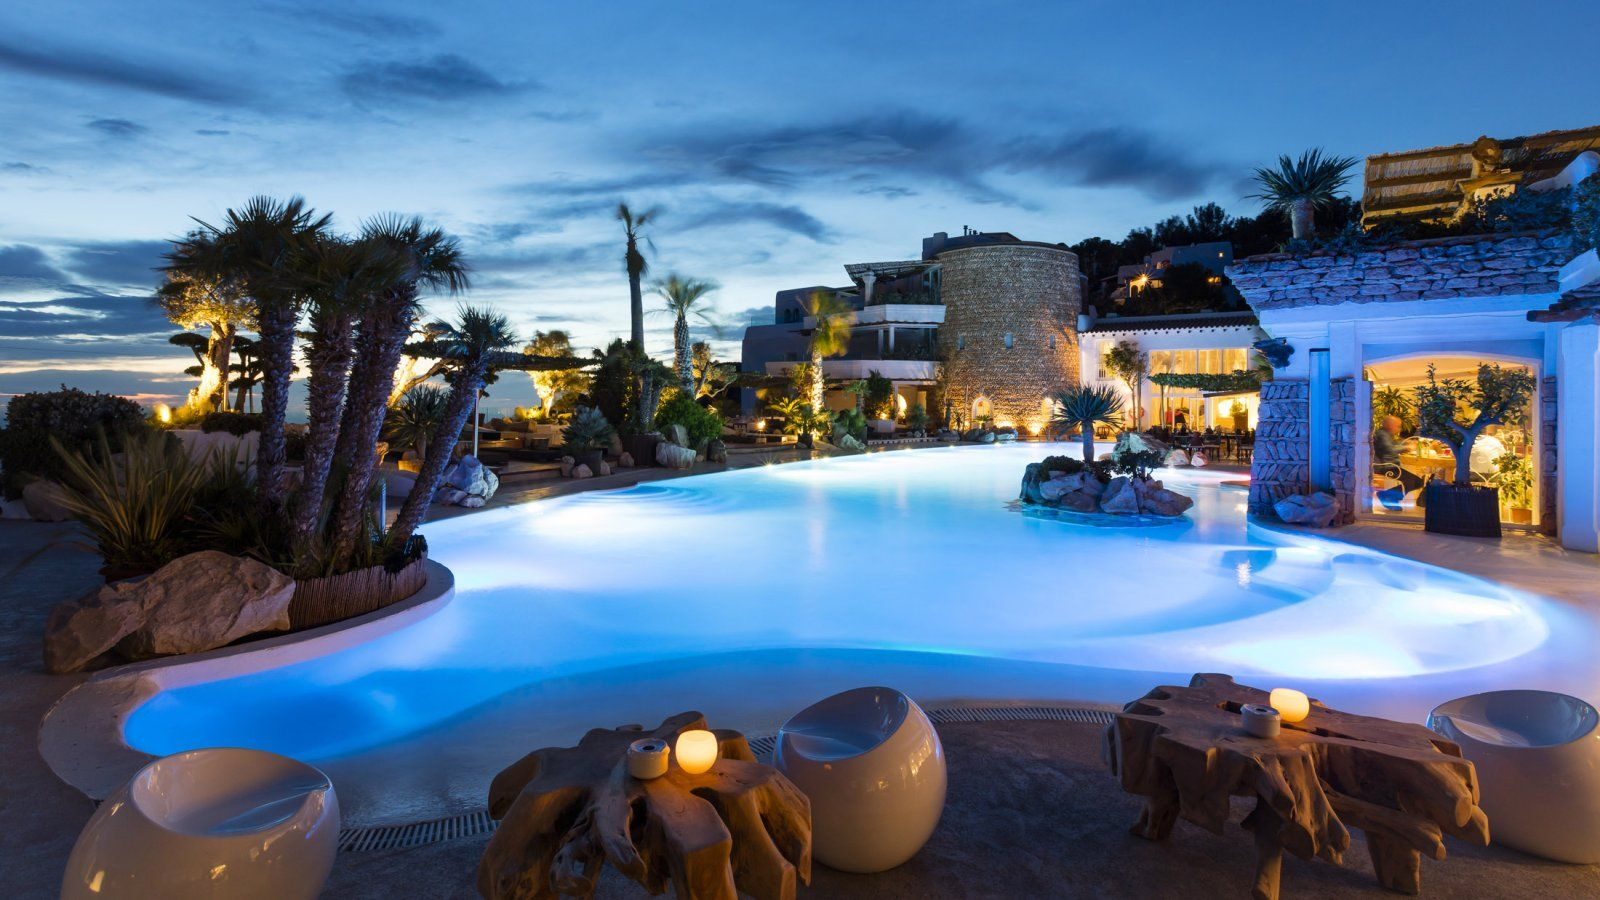 Piscina exterior ana xamena ibiza mis hoteles con encanto pinterest ibiza piscinas y - Hoteles con encanto y piscina ...